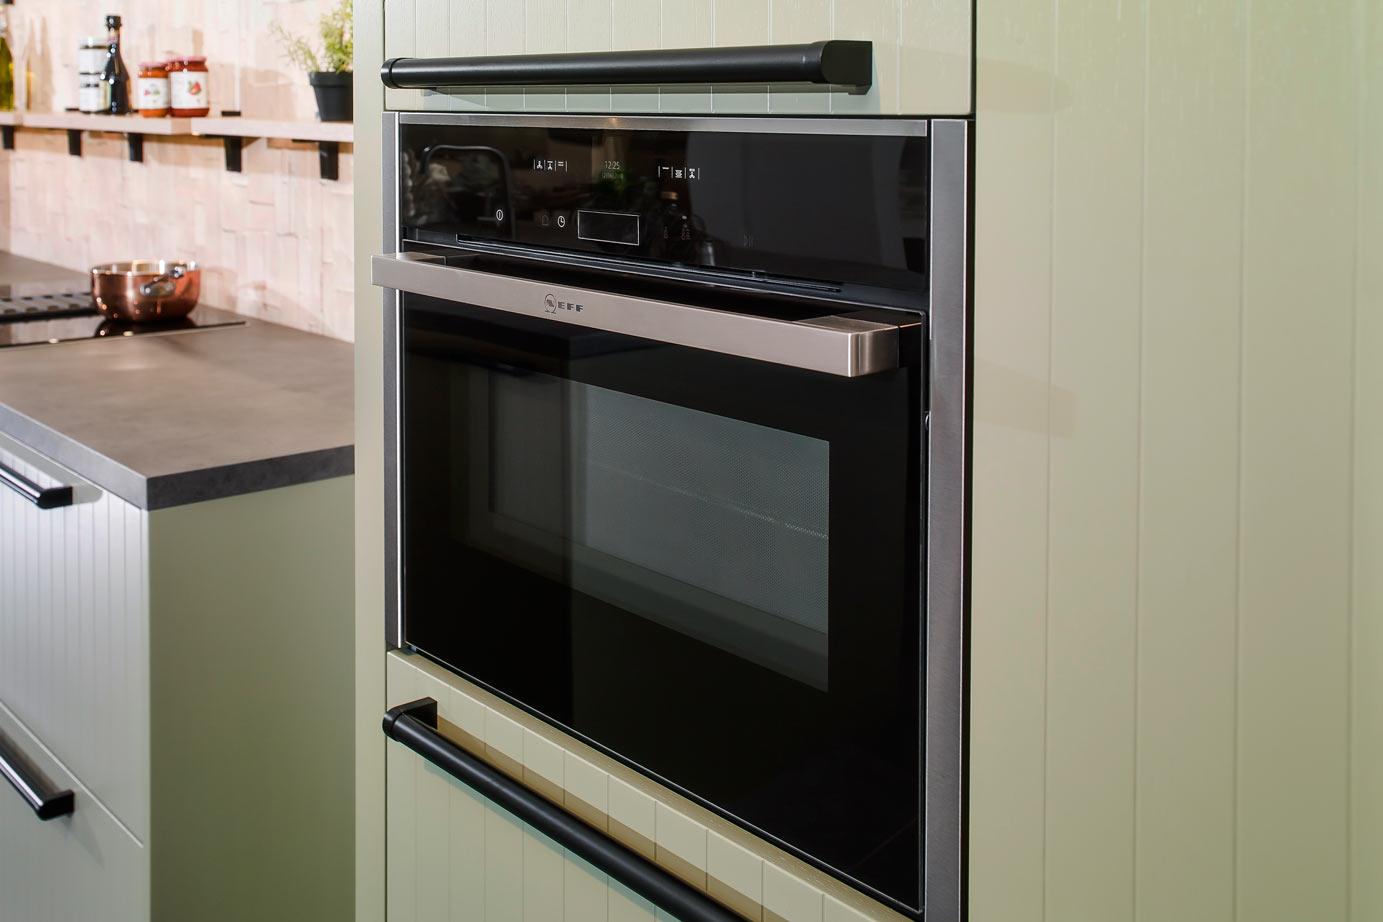 Duurzame en moderne keuken kopen kom langs bij bulthaup brussels